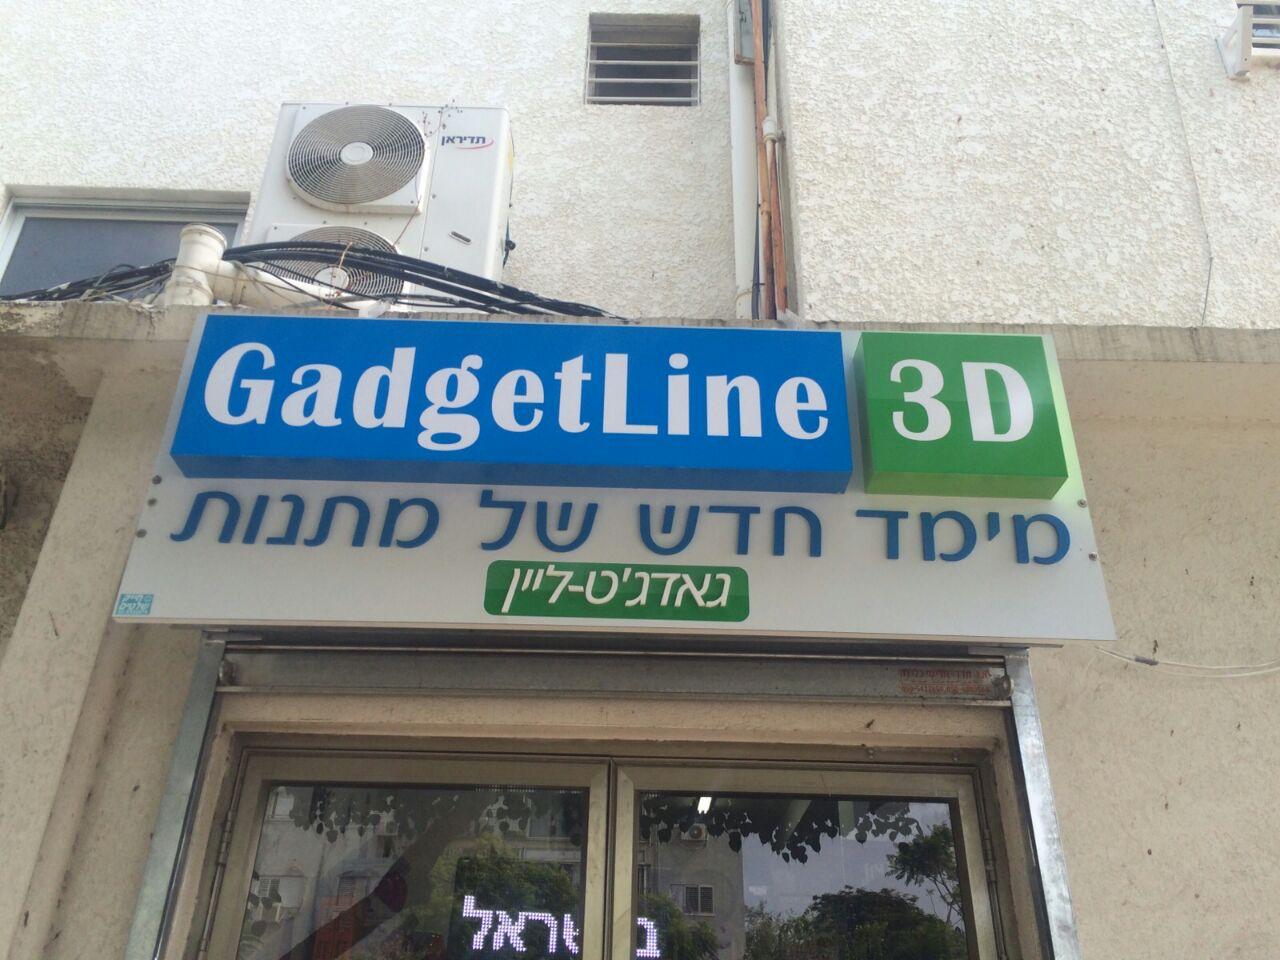 gadget line 3d